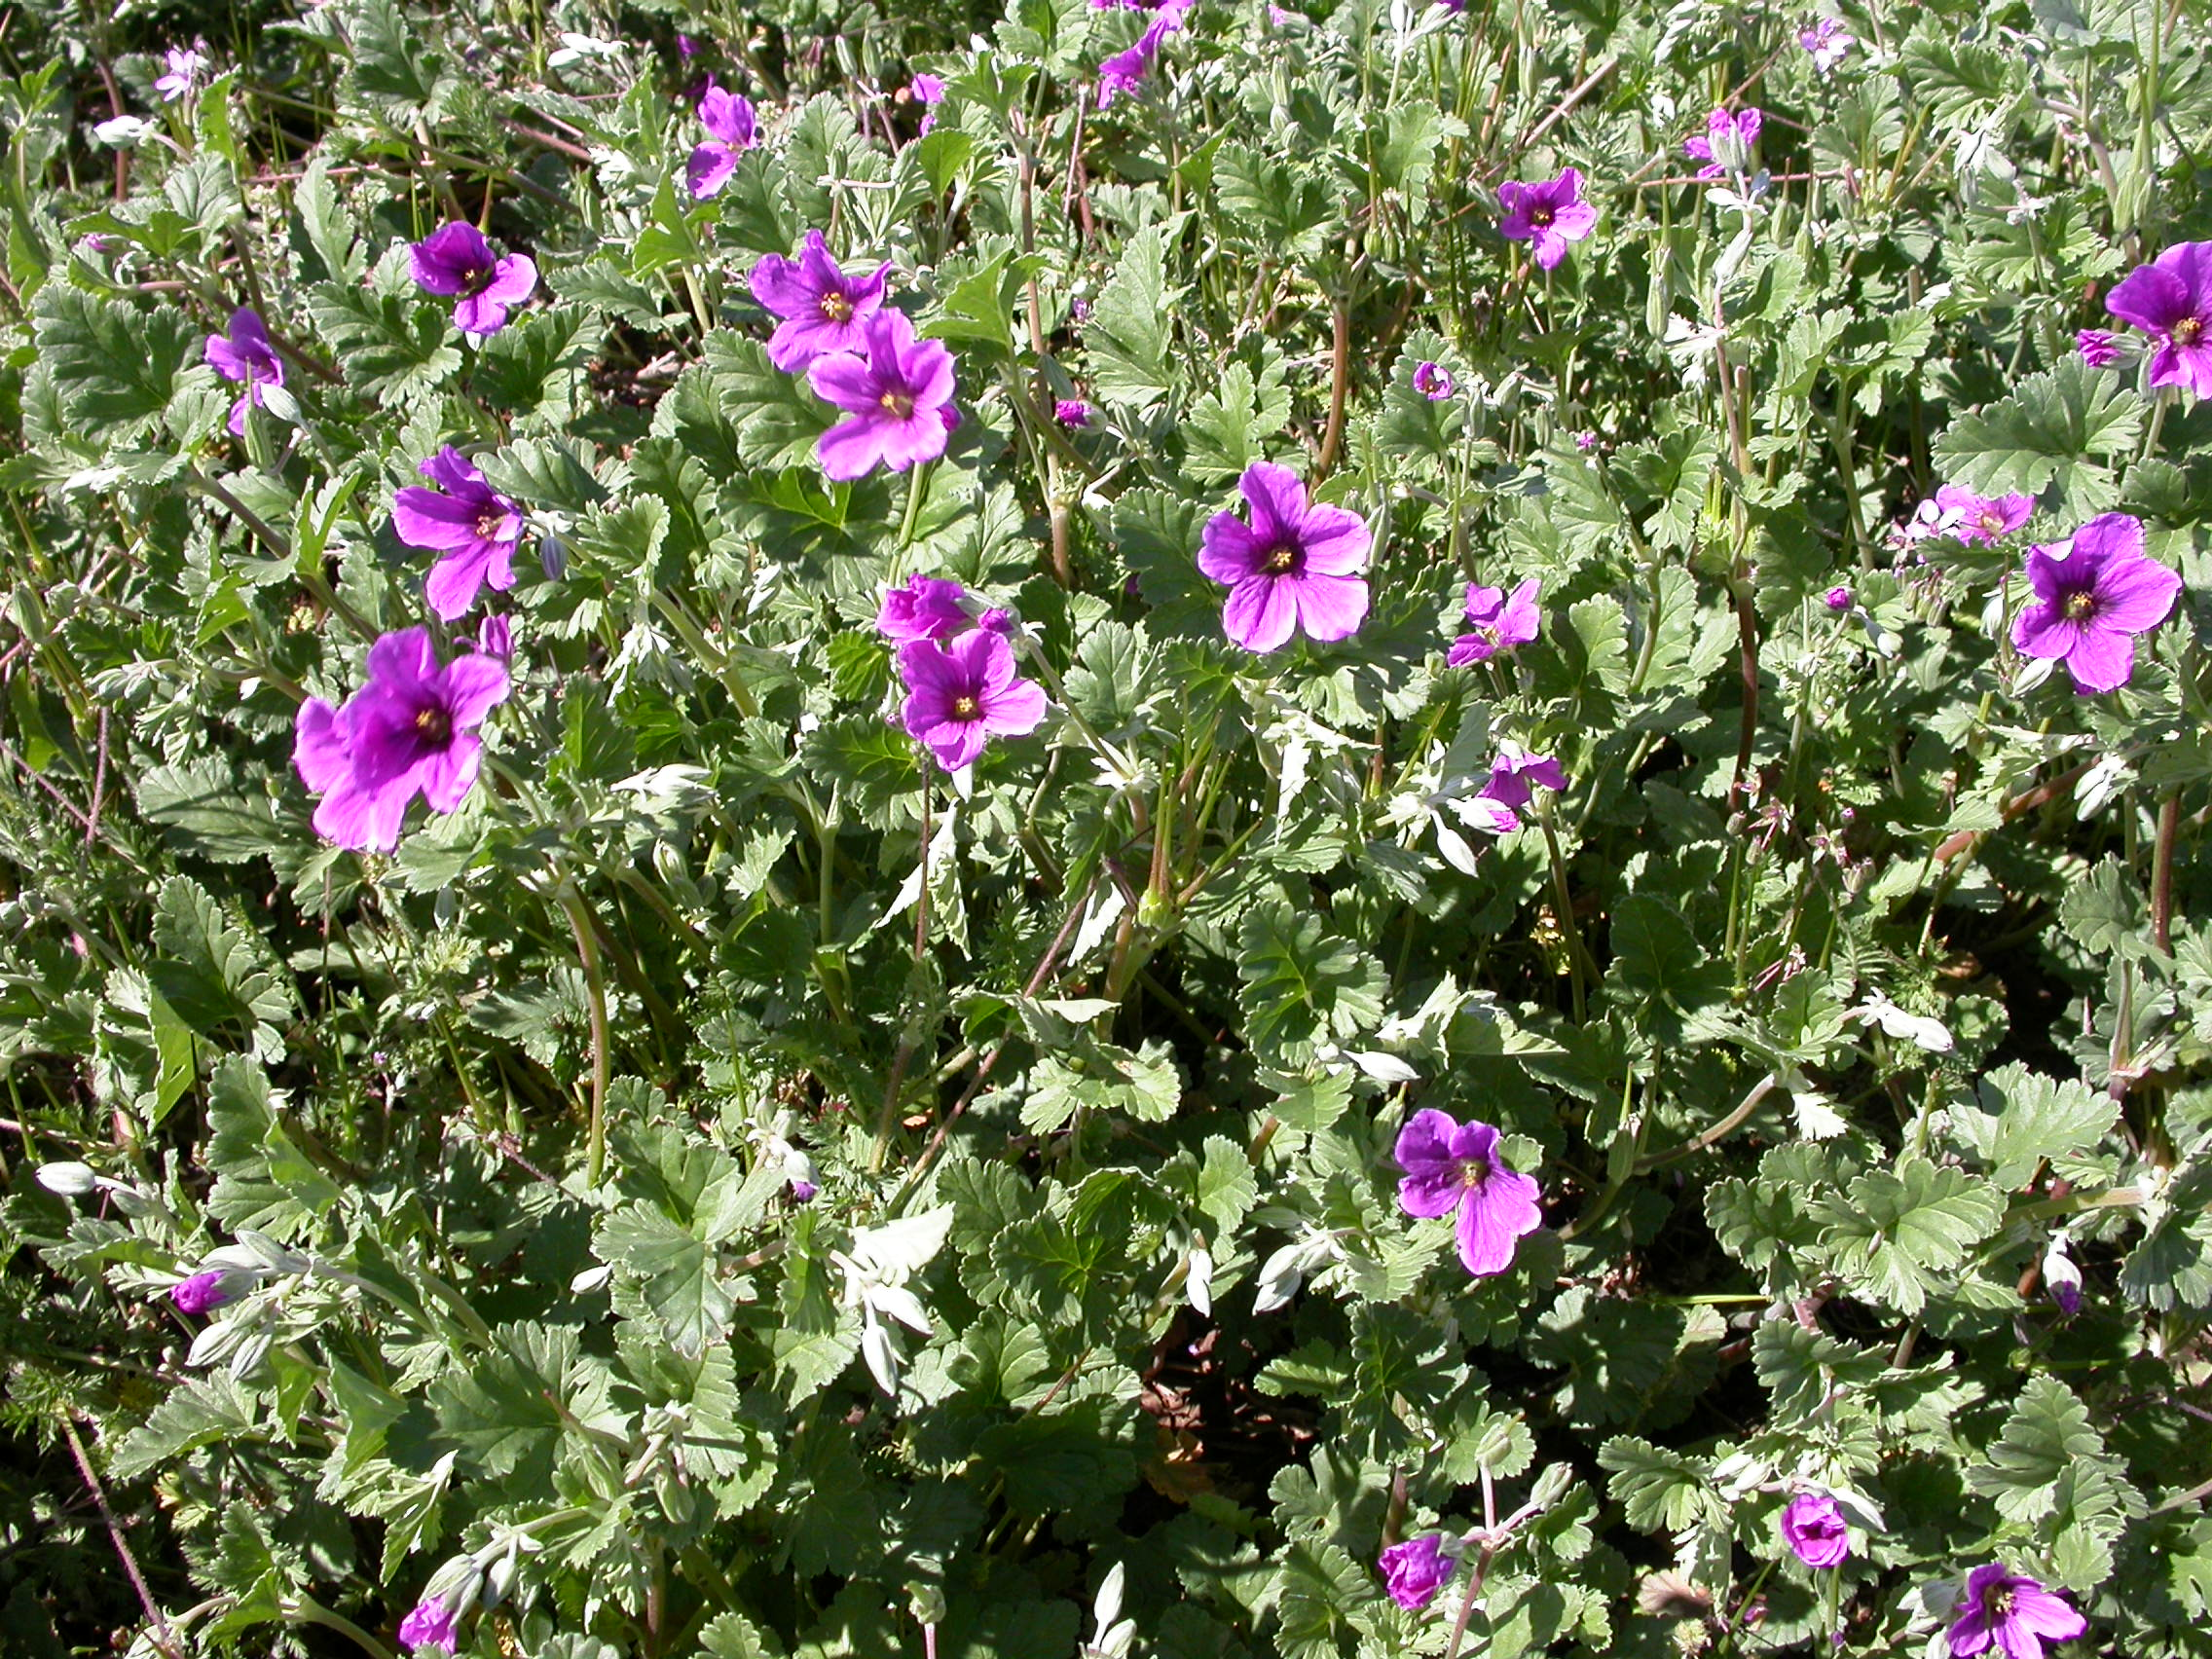 Weeds of field crops 3 4 mightylinksfo